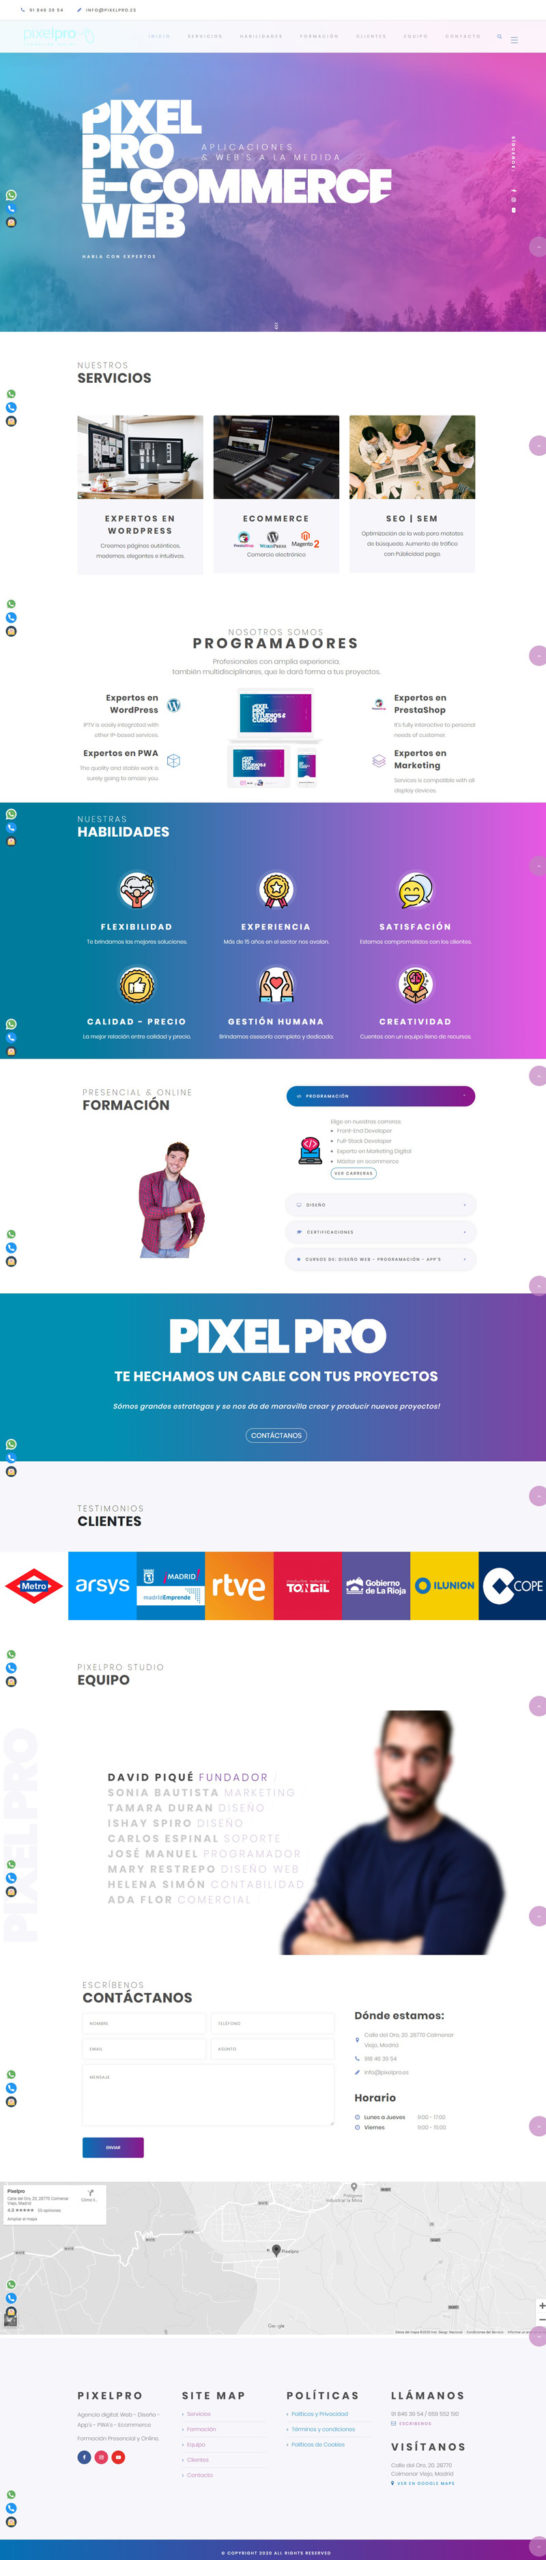 Diseño web moderno pixelpro Studio